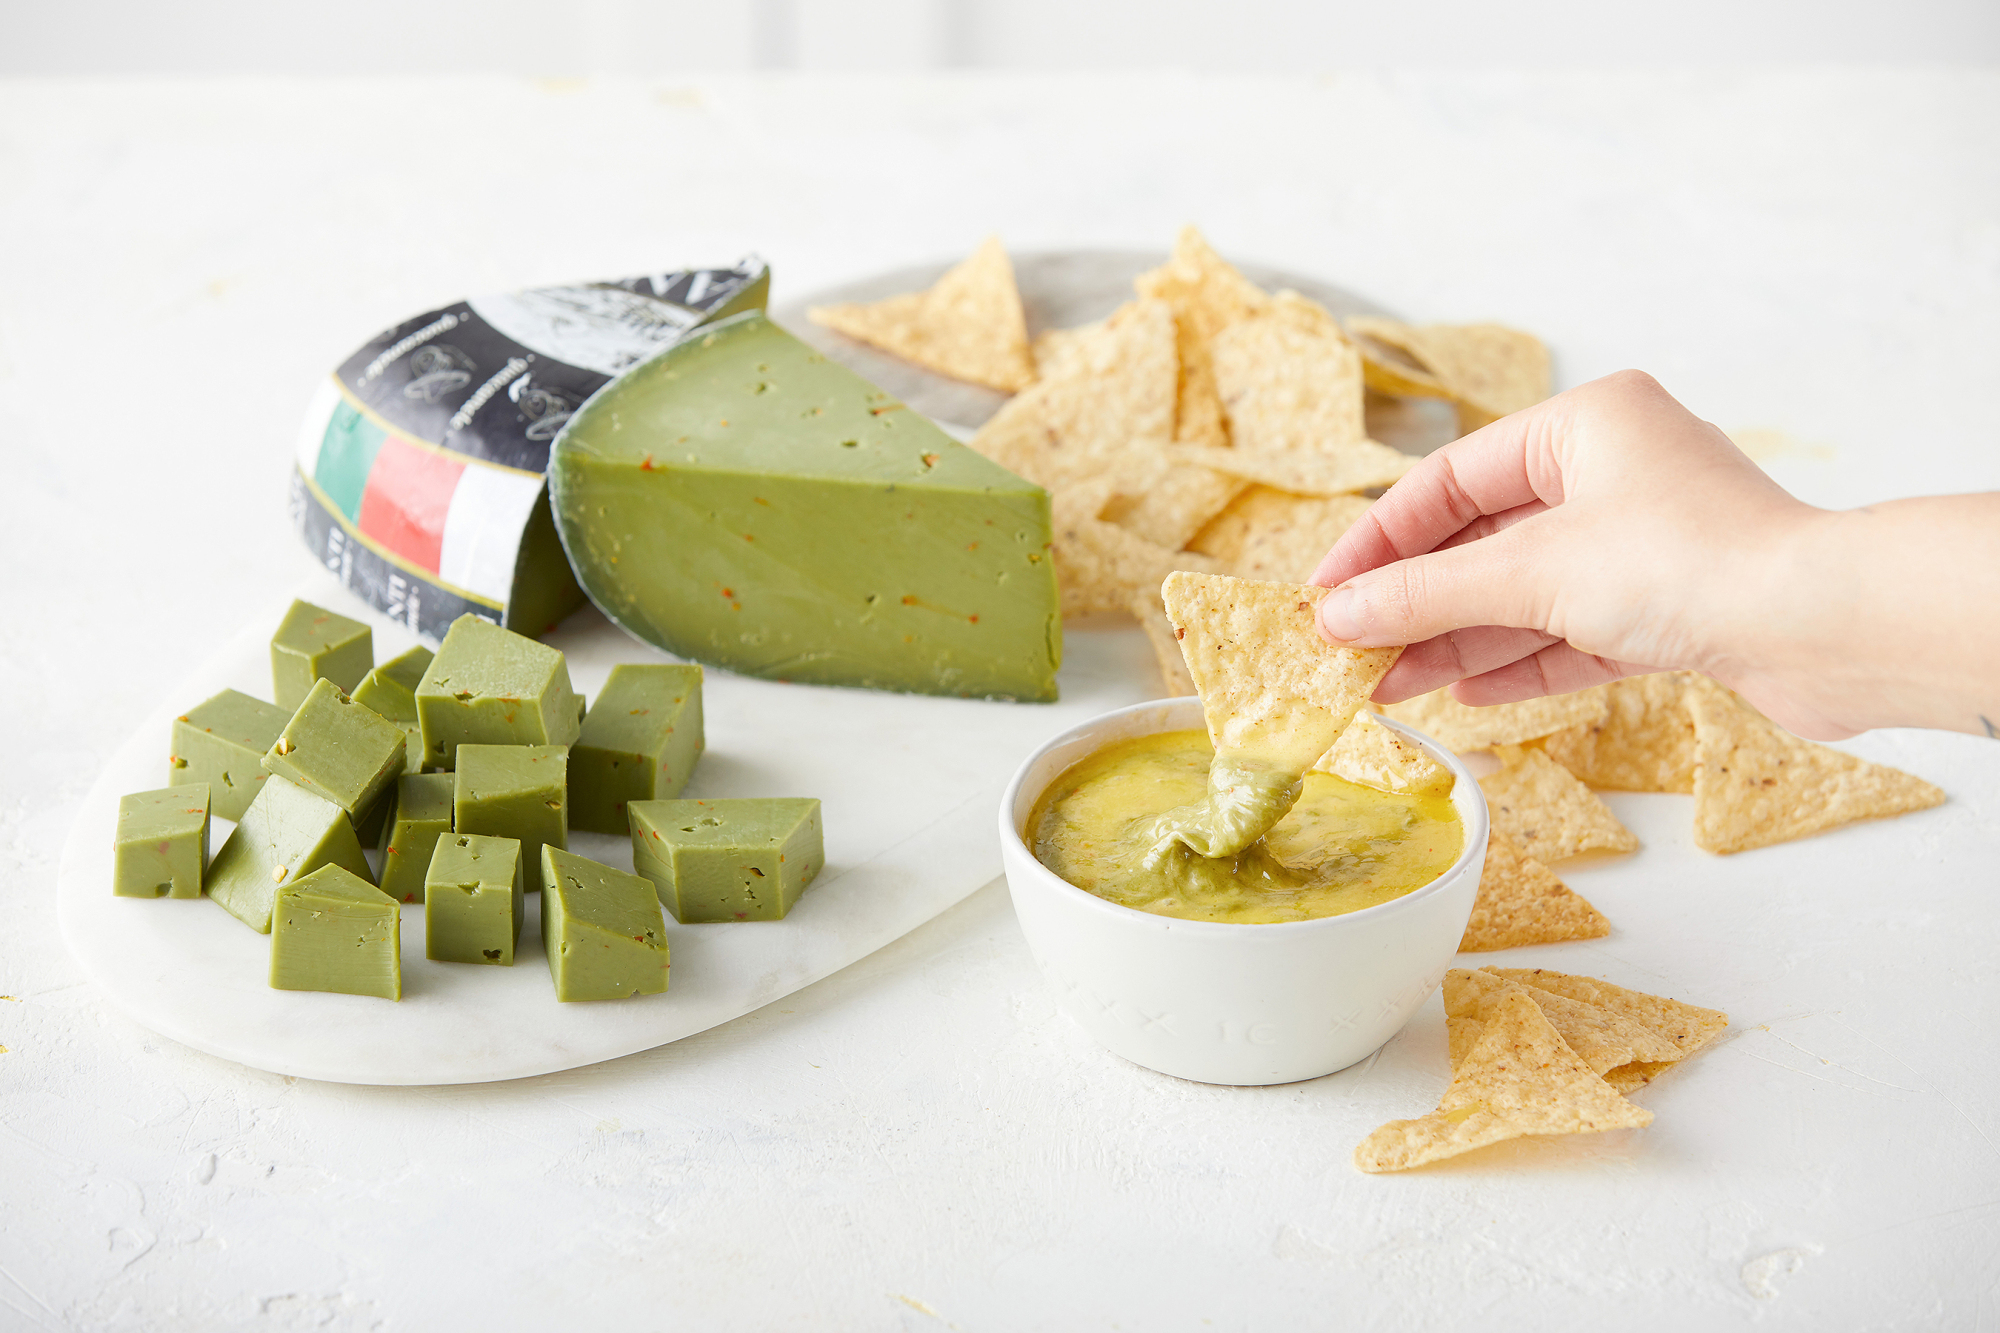 Amanti Guacamole Cheese-60170200